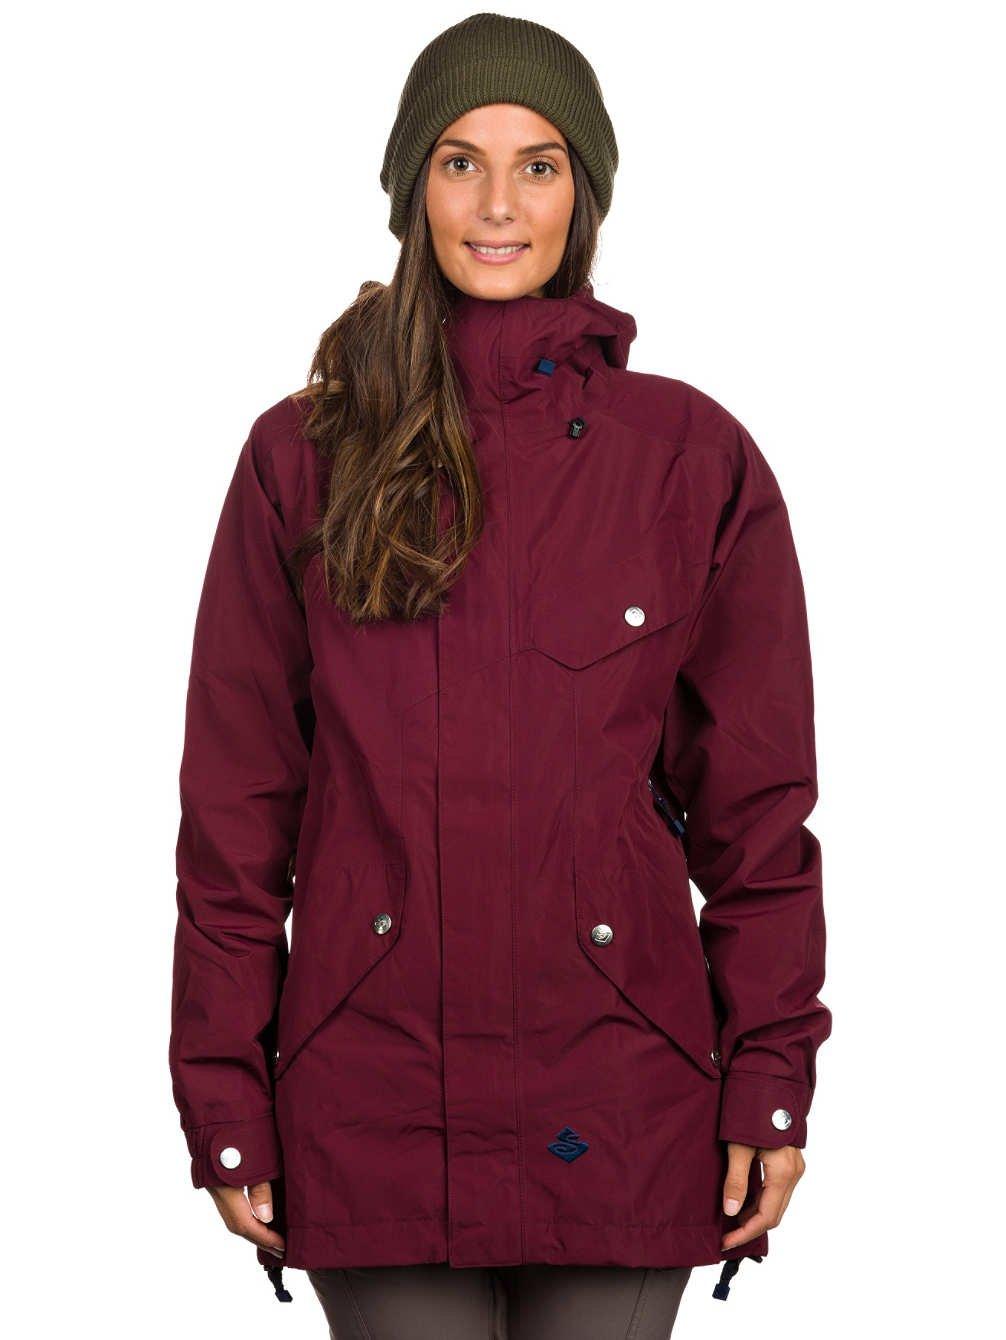 Sweet Protection Damen Jacket Chiquitita jetzt kaufen